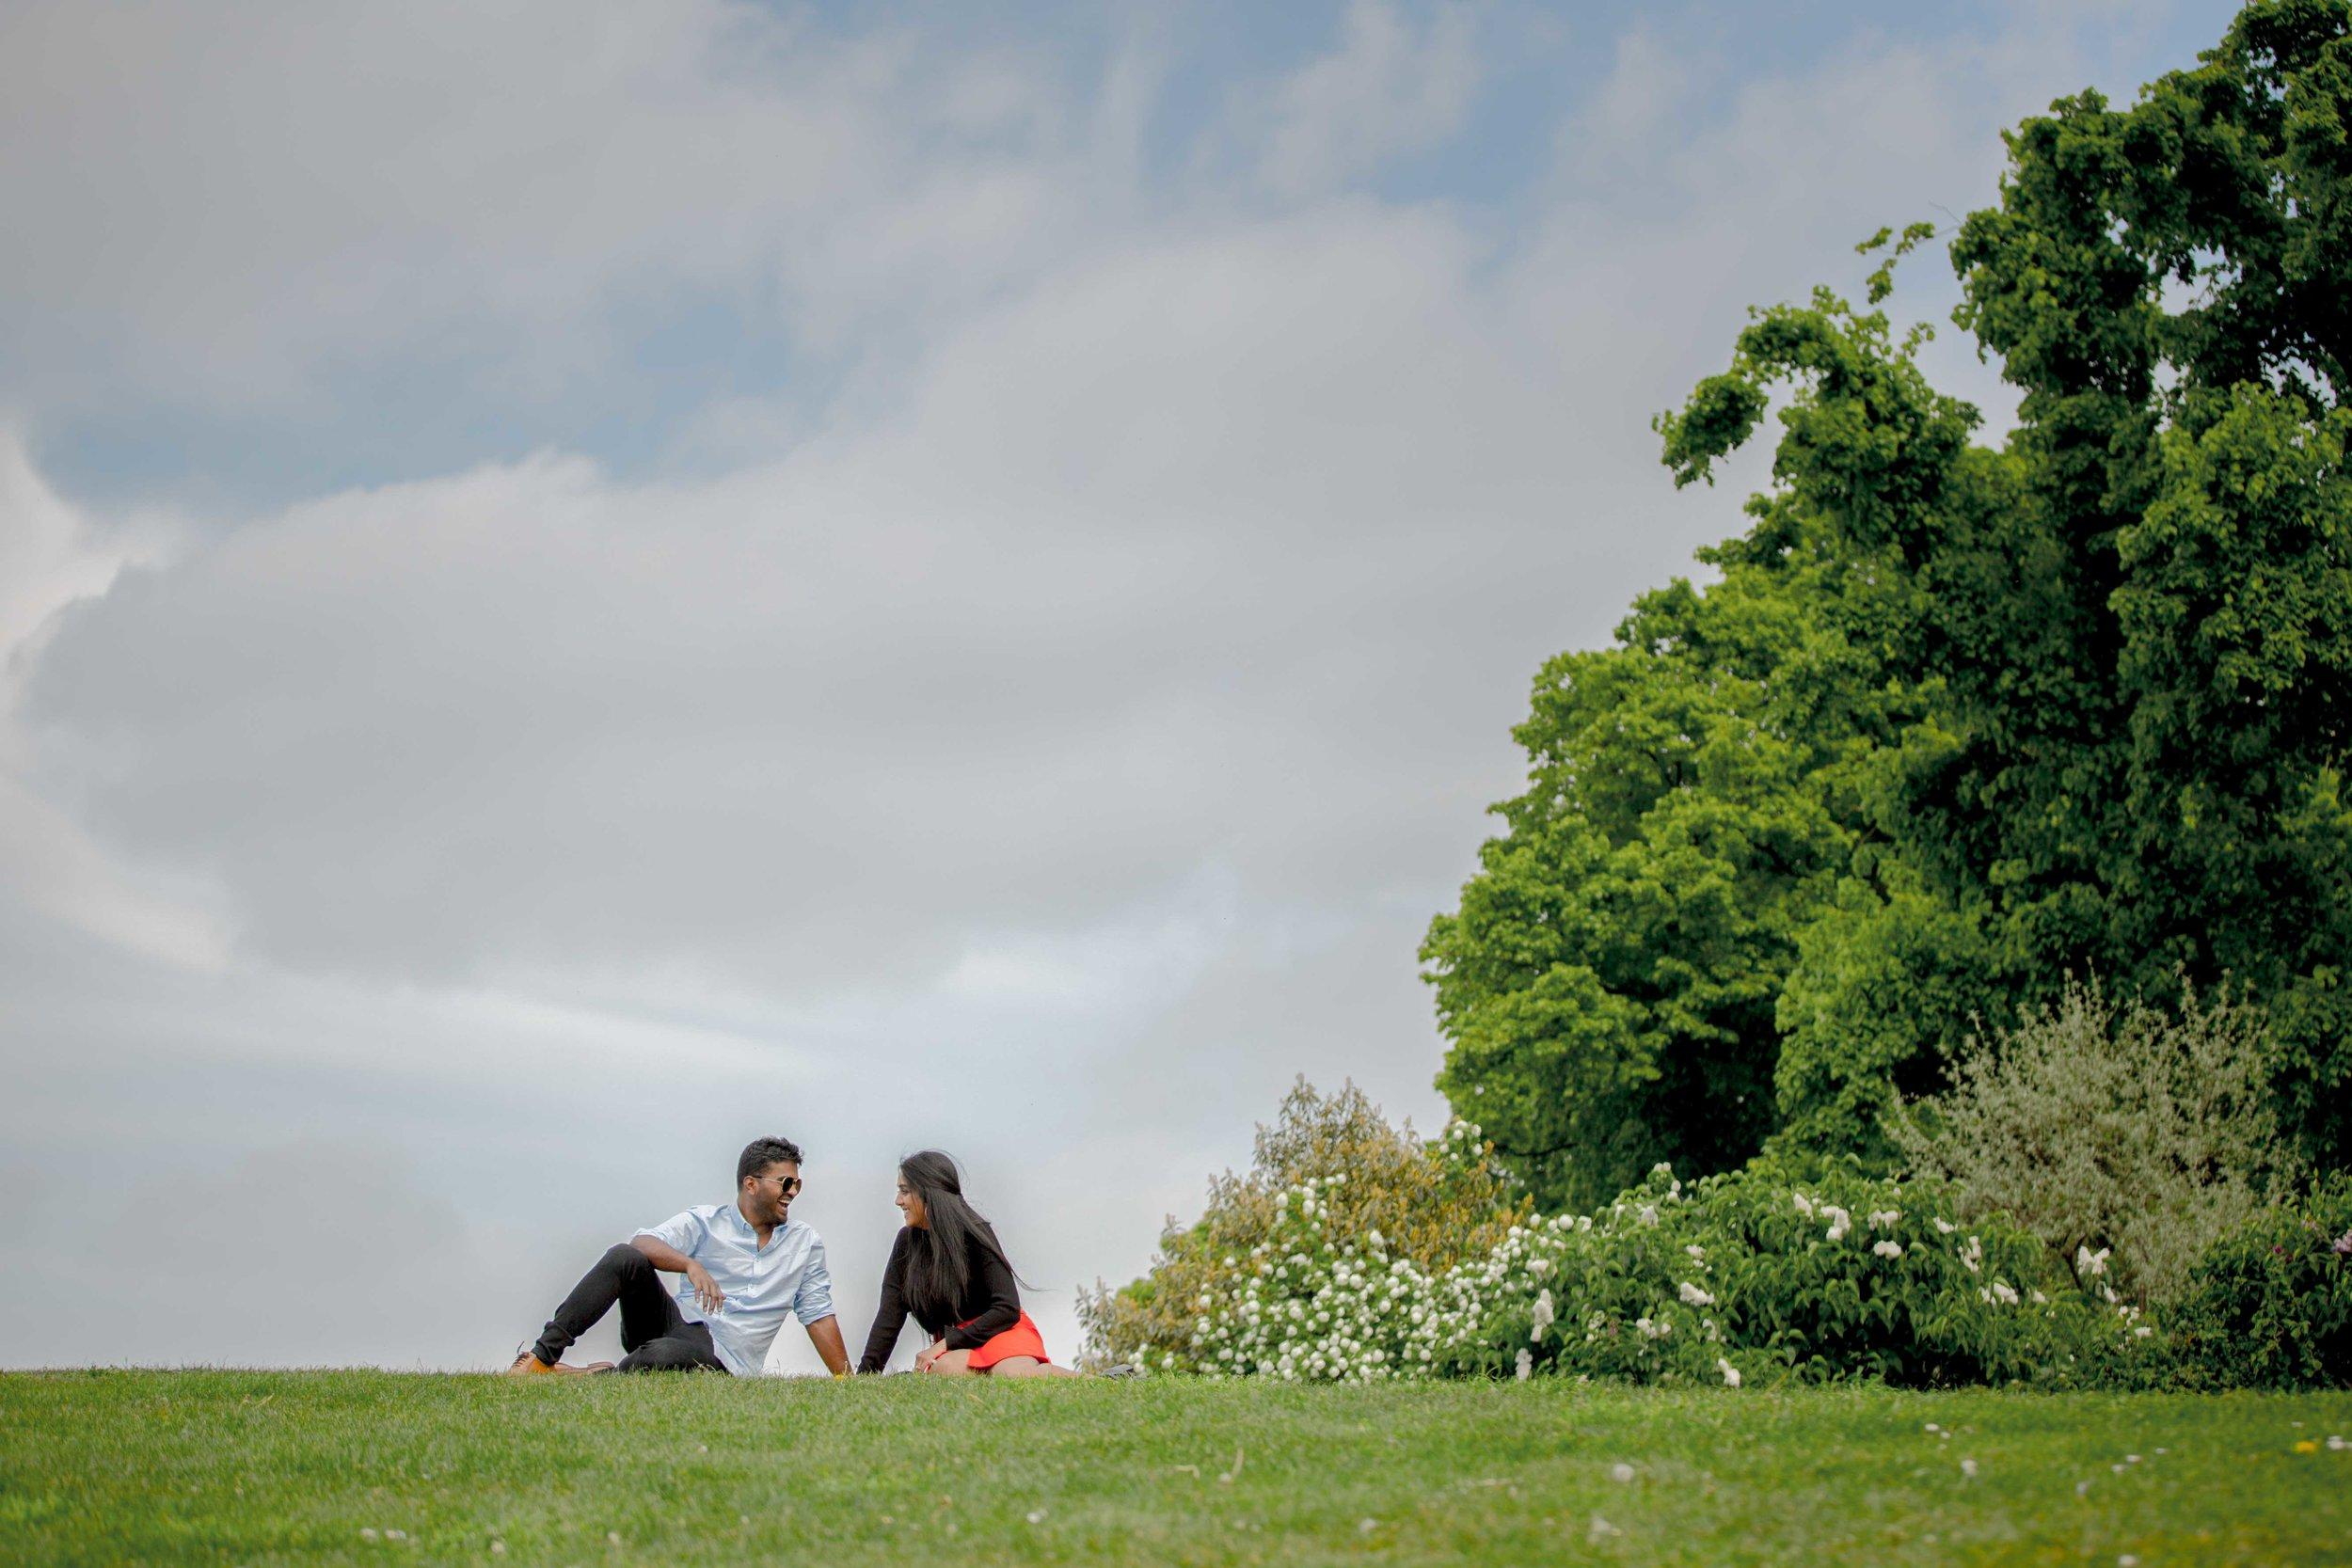 Battersea-park-pre-wedding-photoshoot-shoot-london-asian-wedding-photographer-natalia-smith-photography-1.jpg